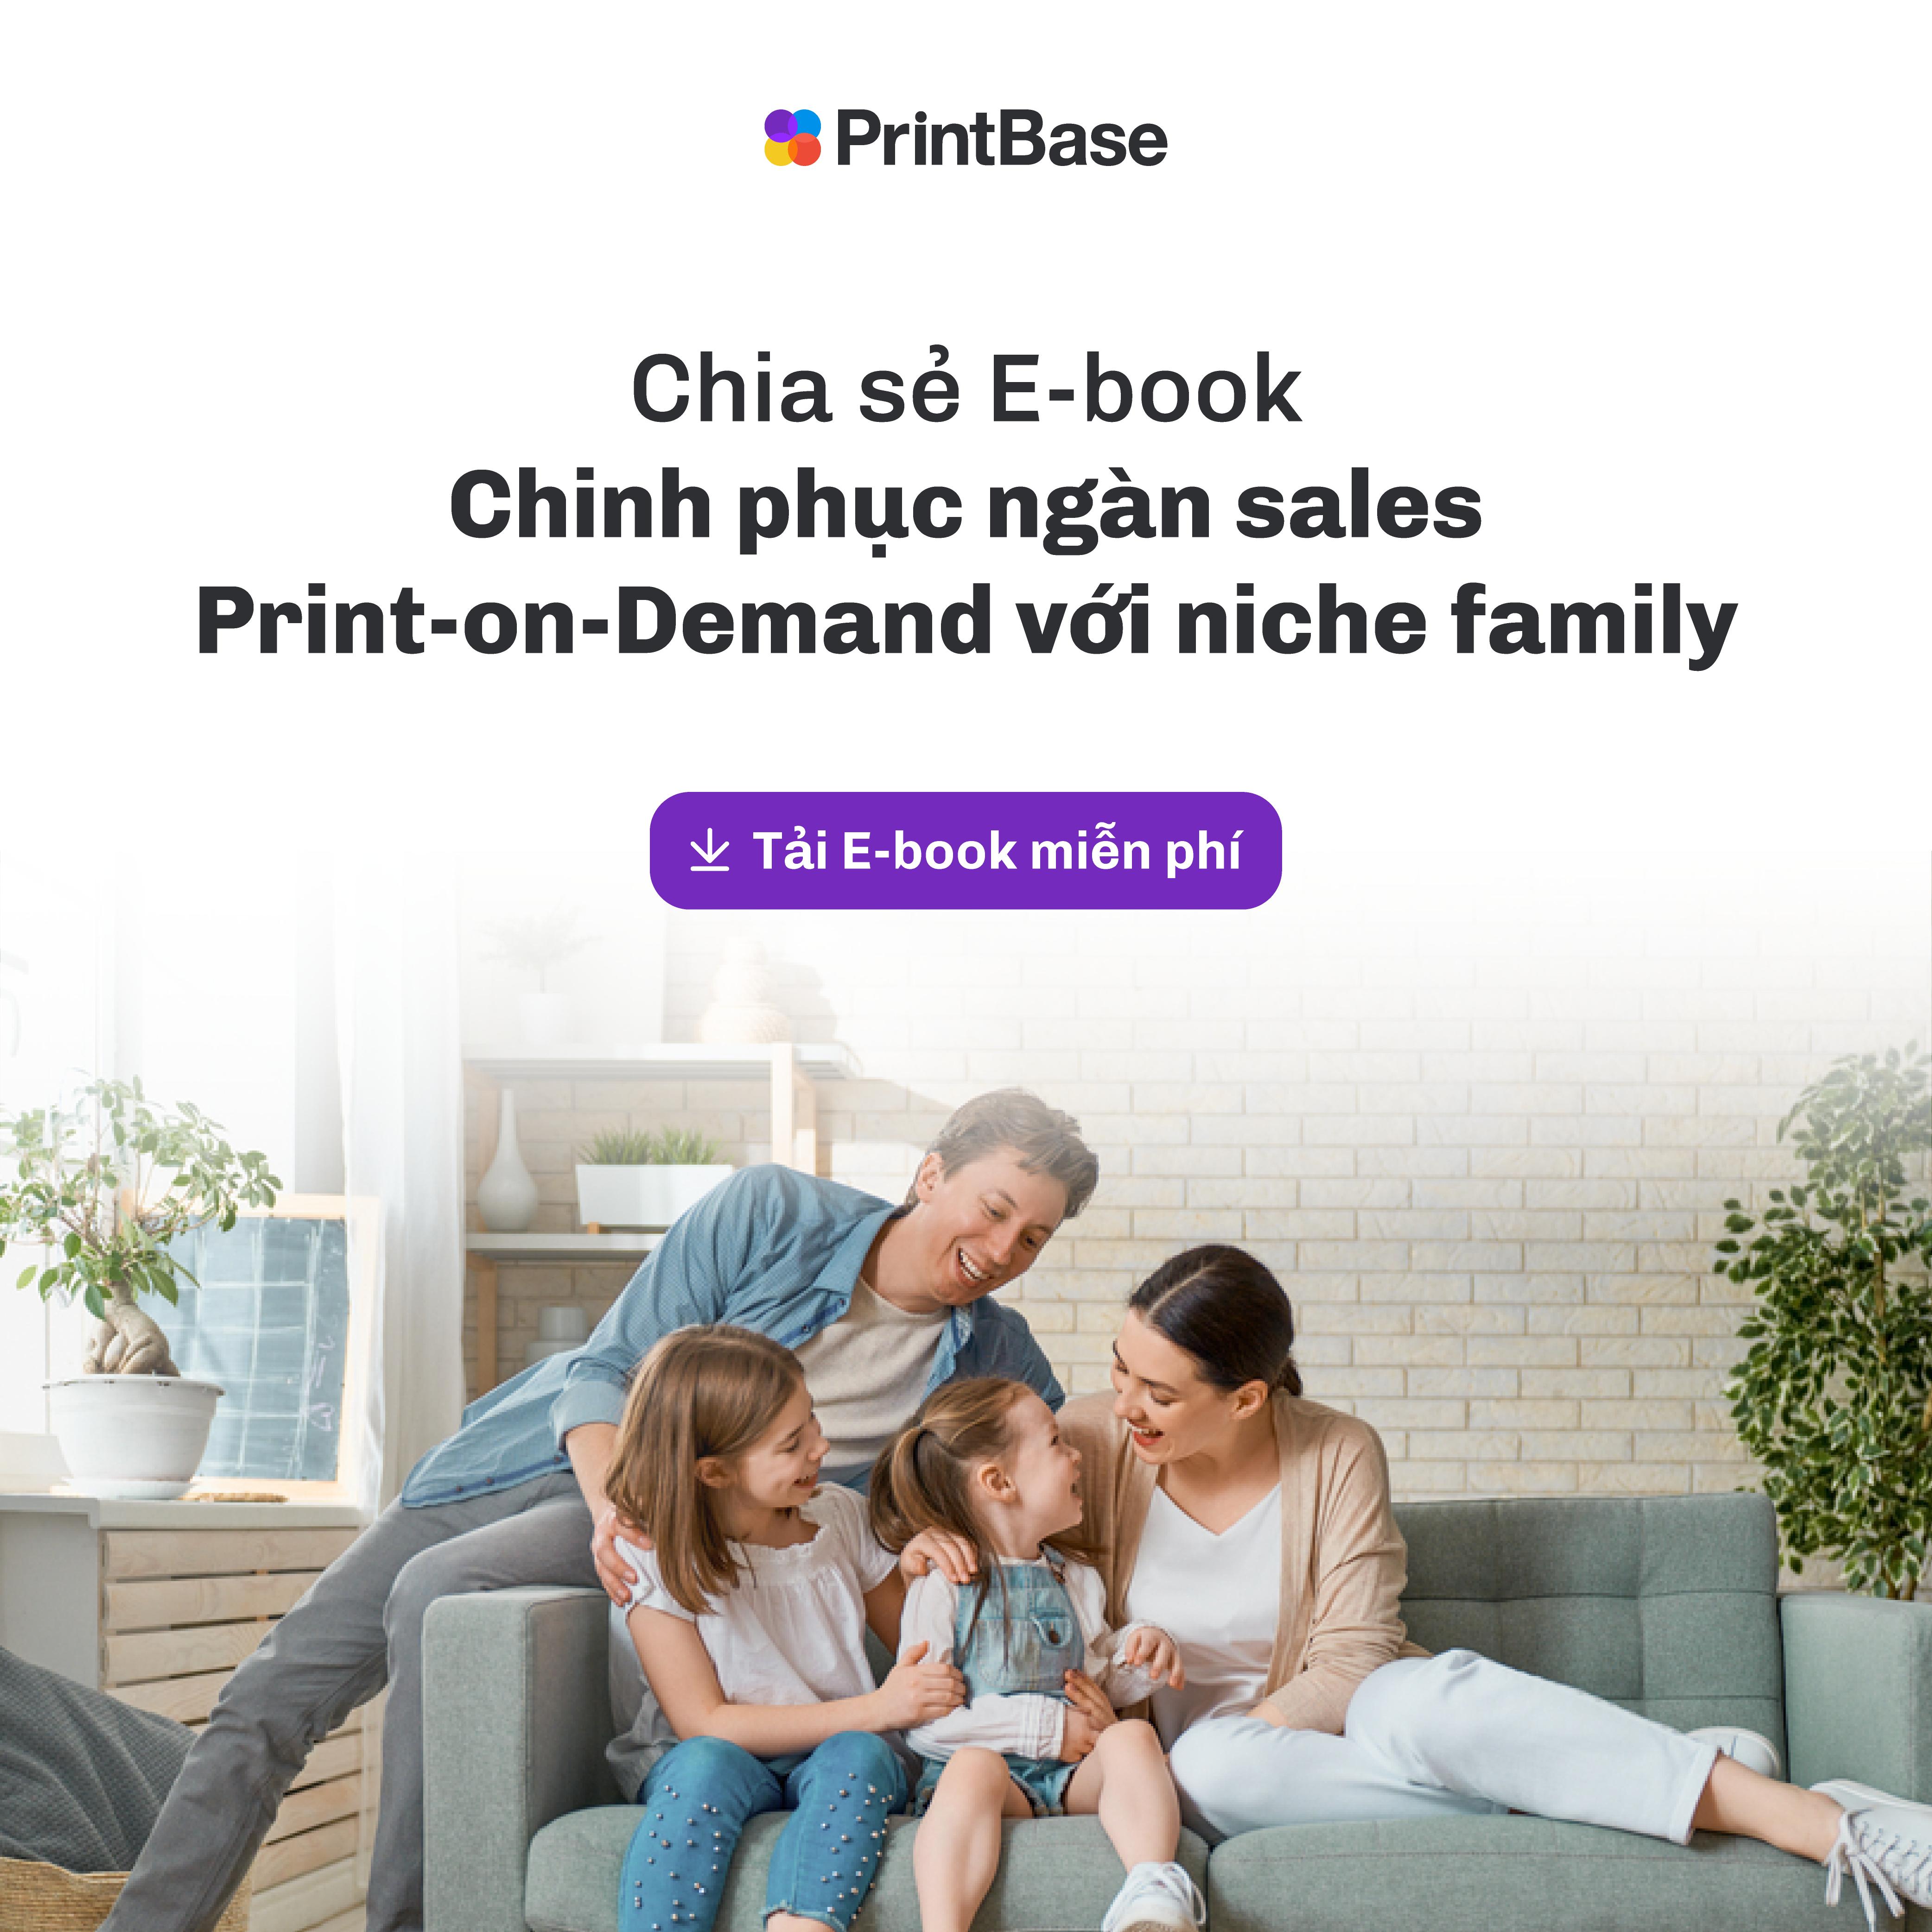 printbase-print-on-demand-ebook-1